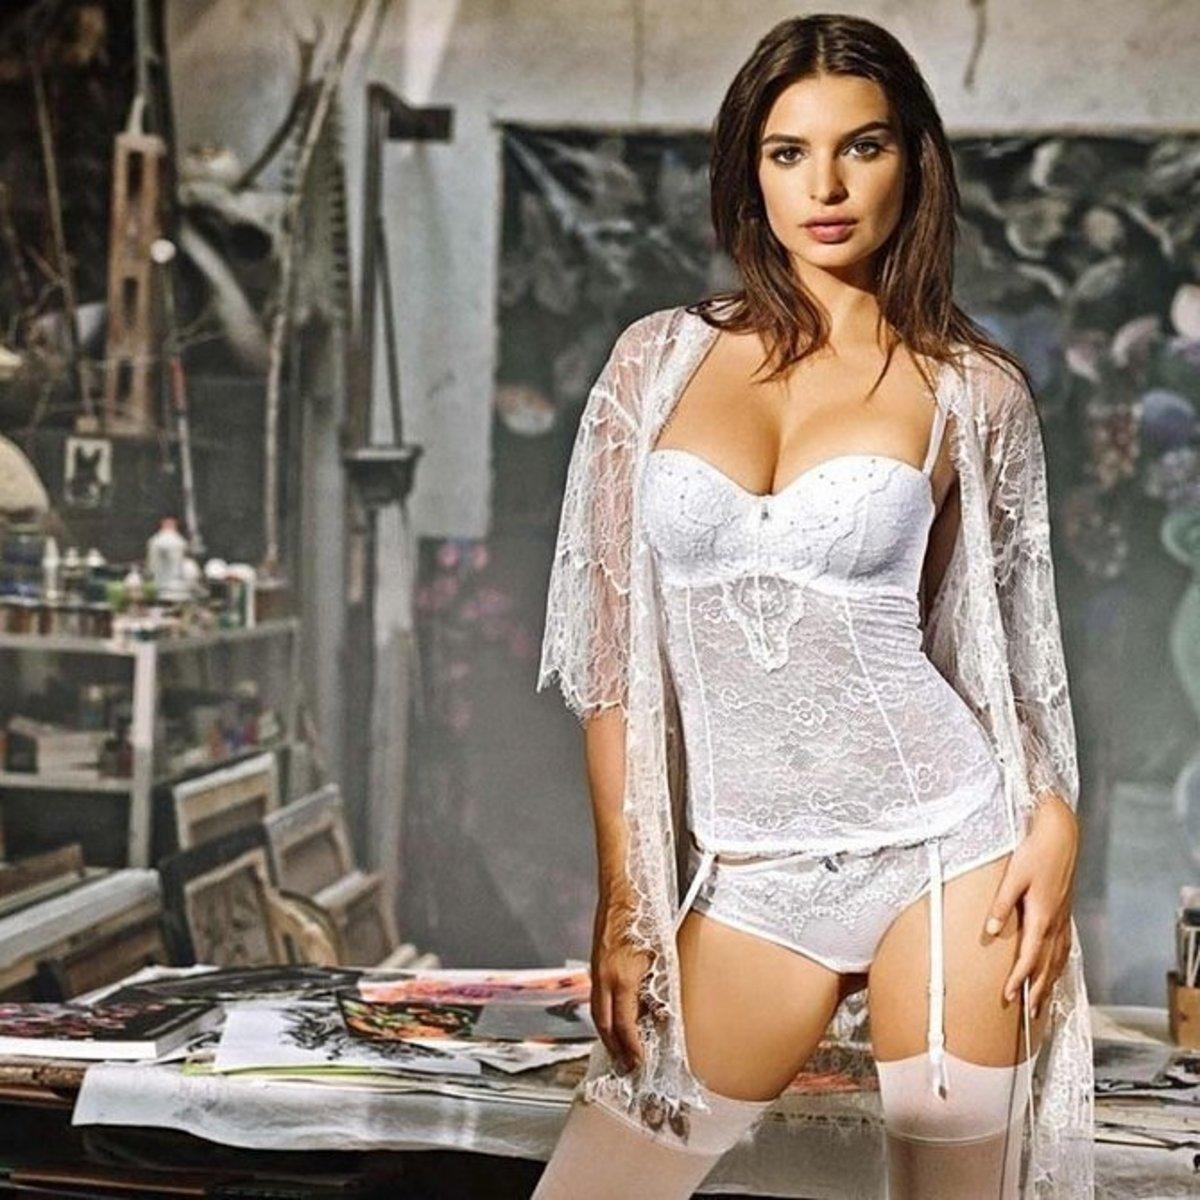 emily-ratajkowski-yamamay-underwear-2014-fall-ad-campaign14-1